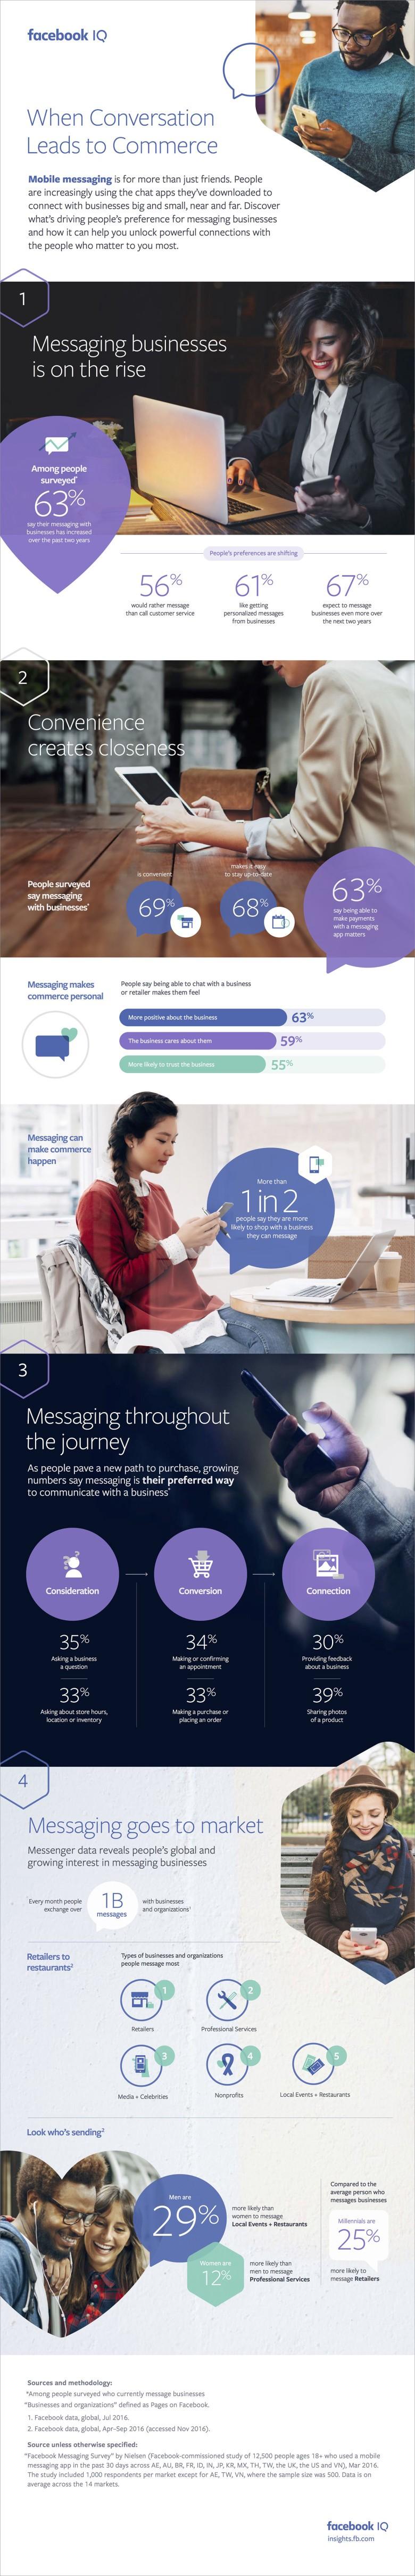 infographie conversational commerce